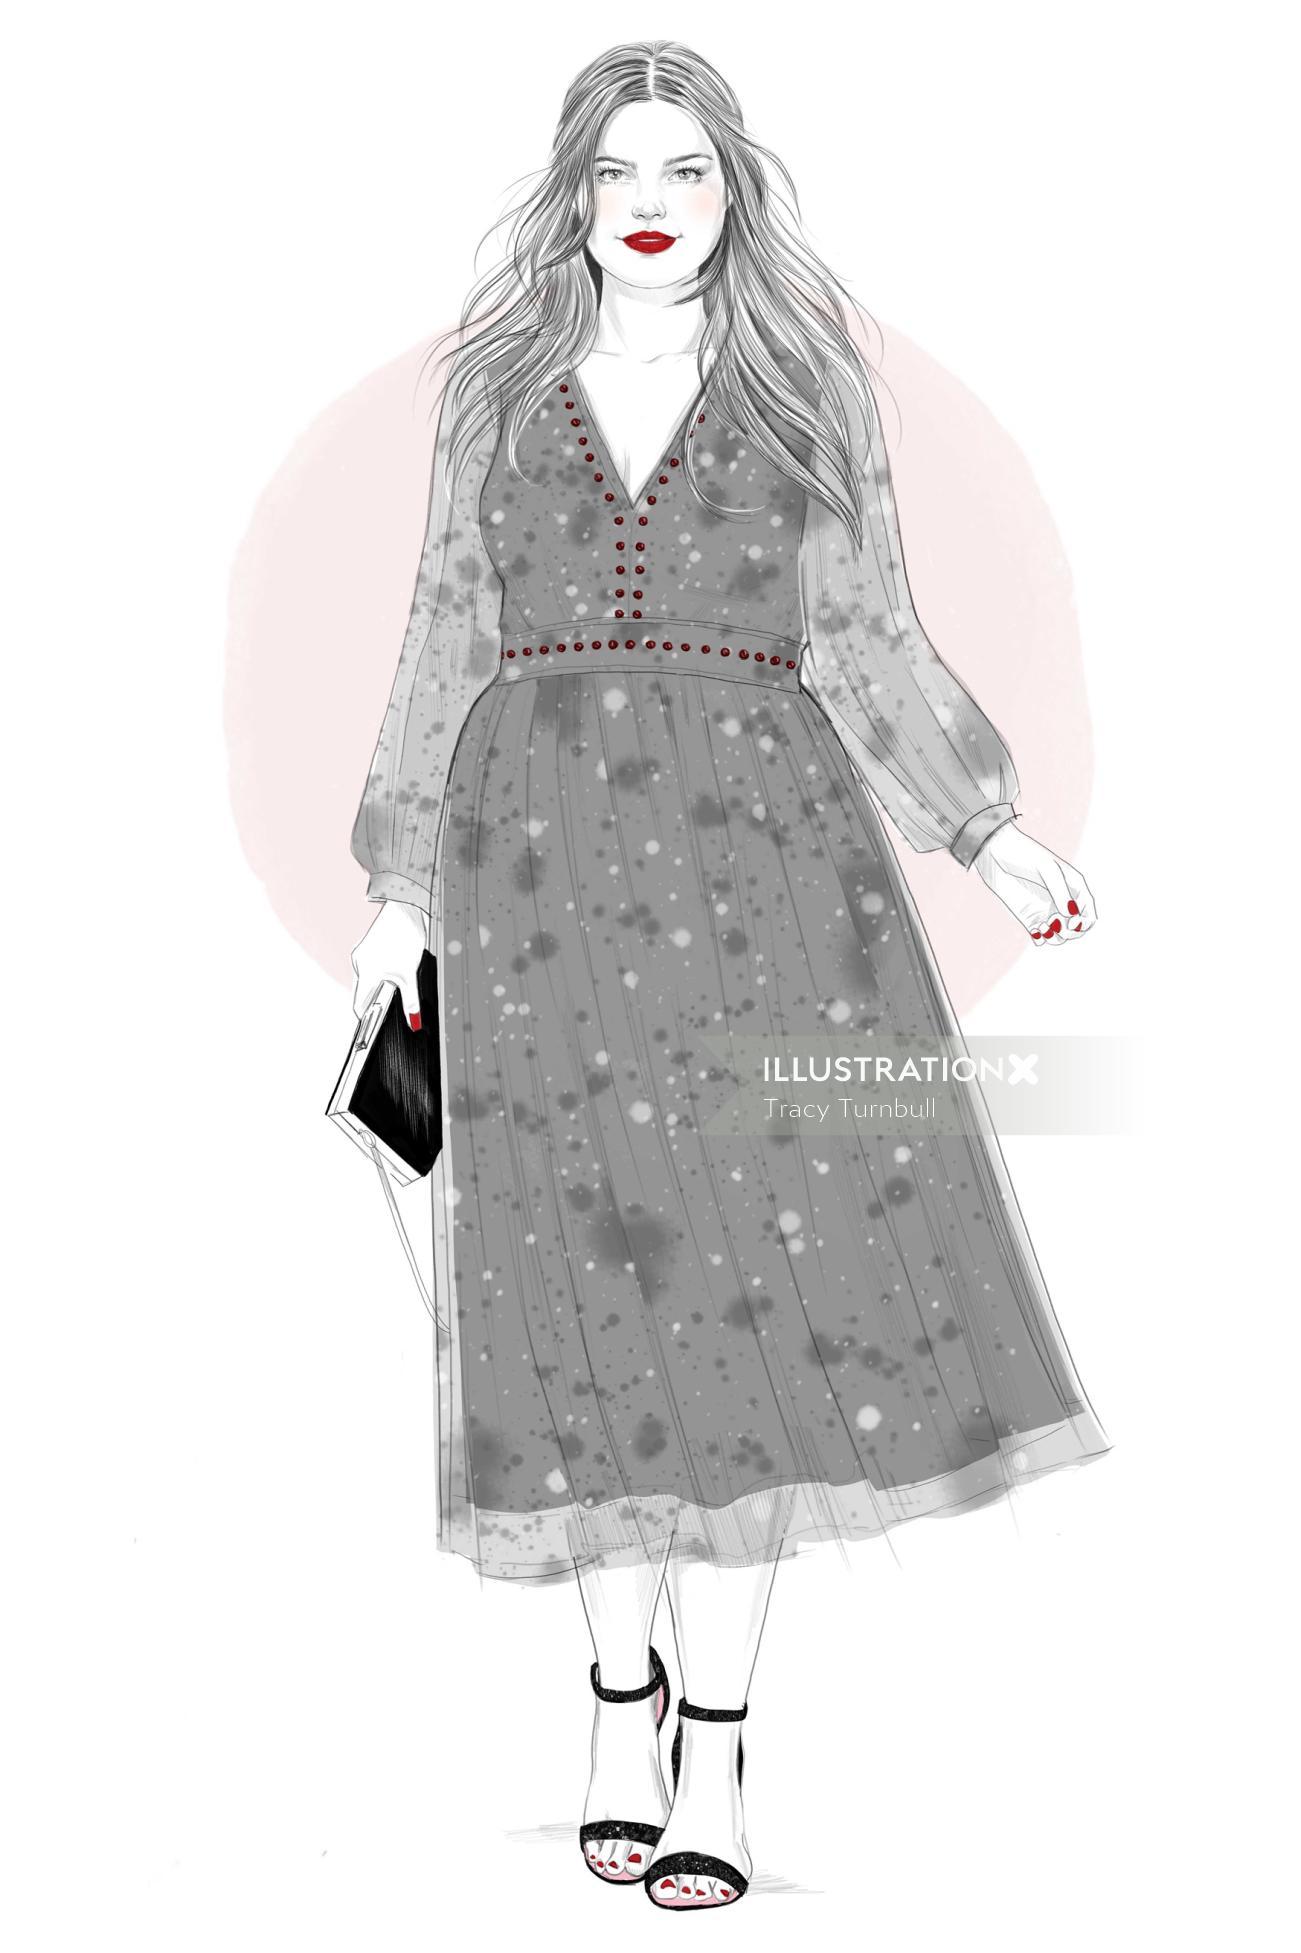 Illustration of Stitchfix girl 4